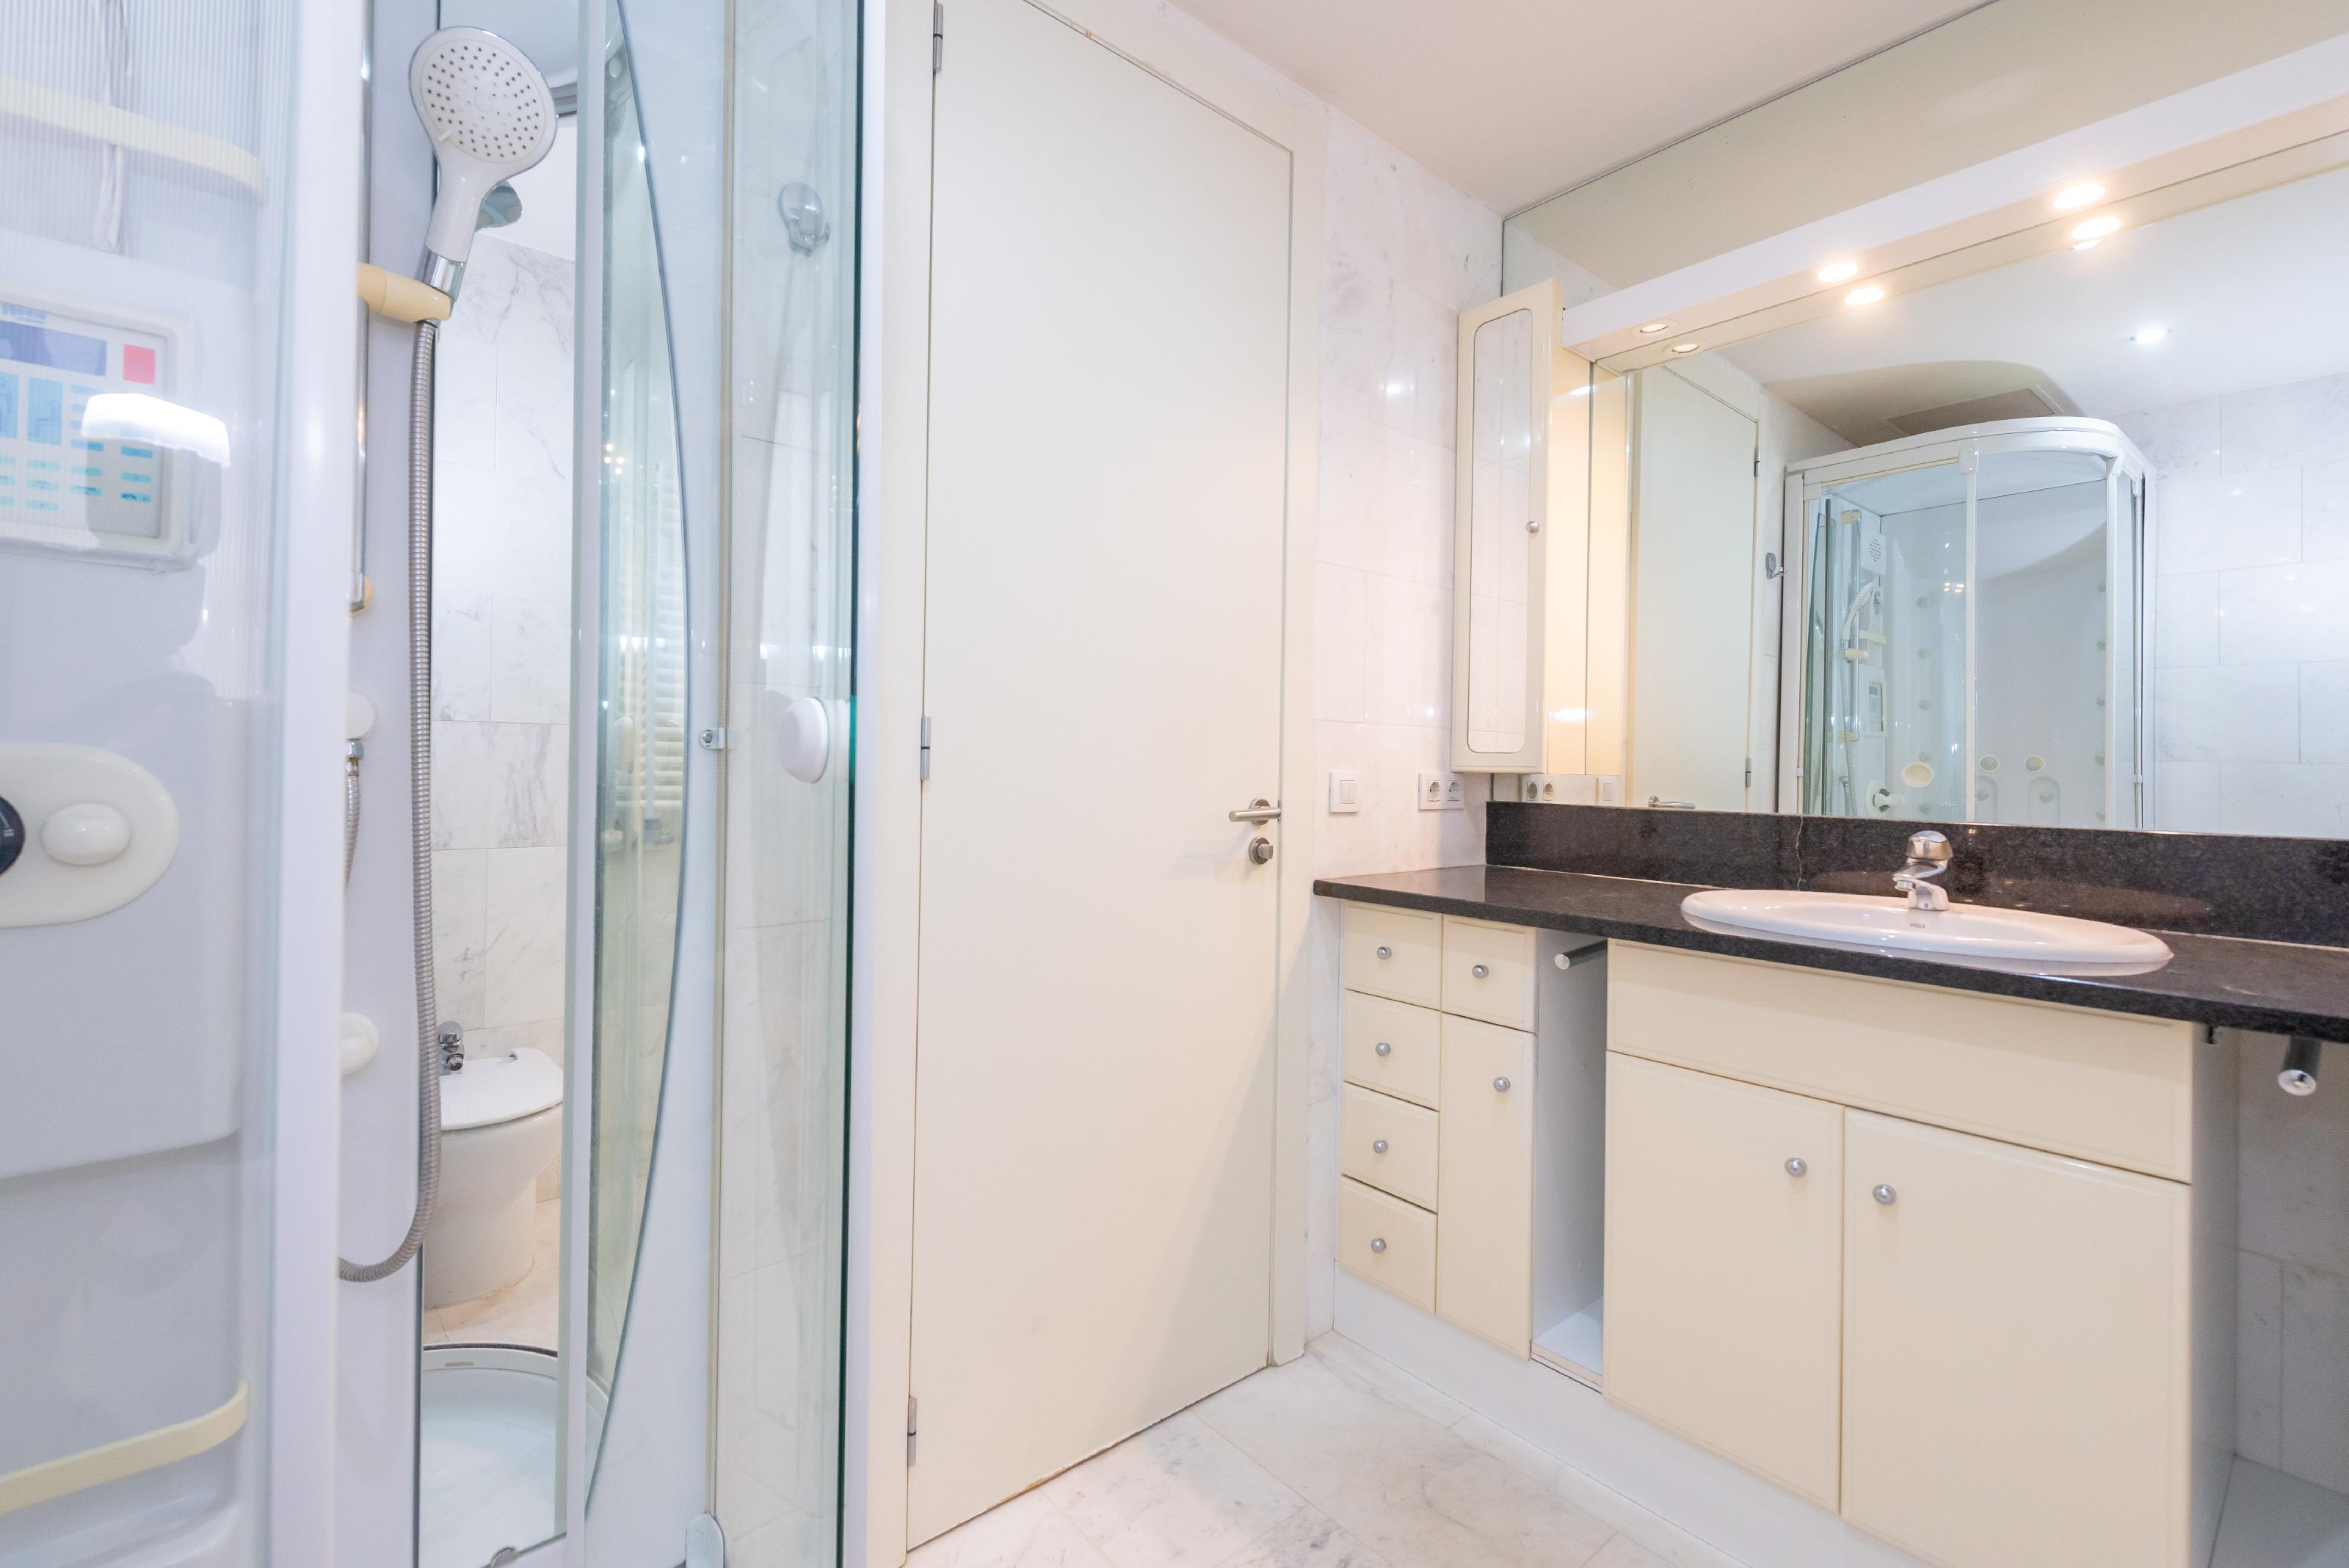 251446 Flat for sale in Sarrià-Sant Gervasi, Tres Torres 27